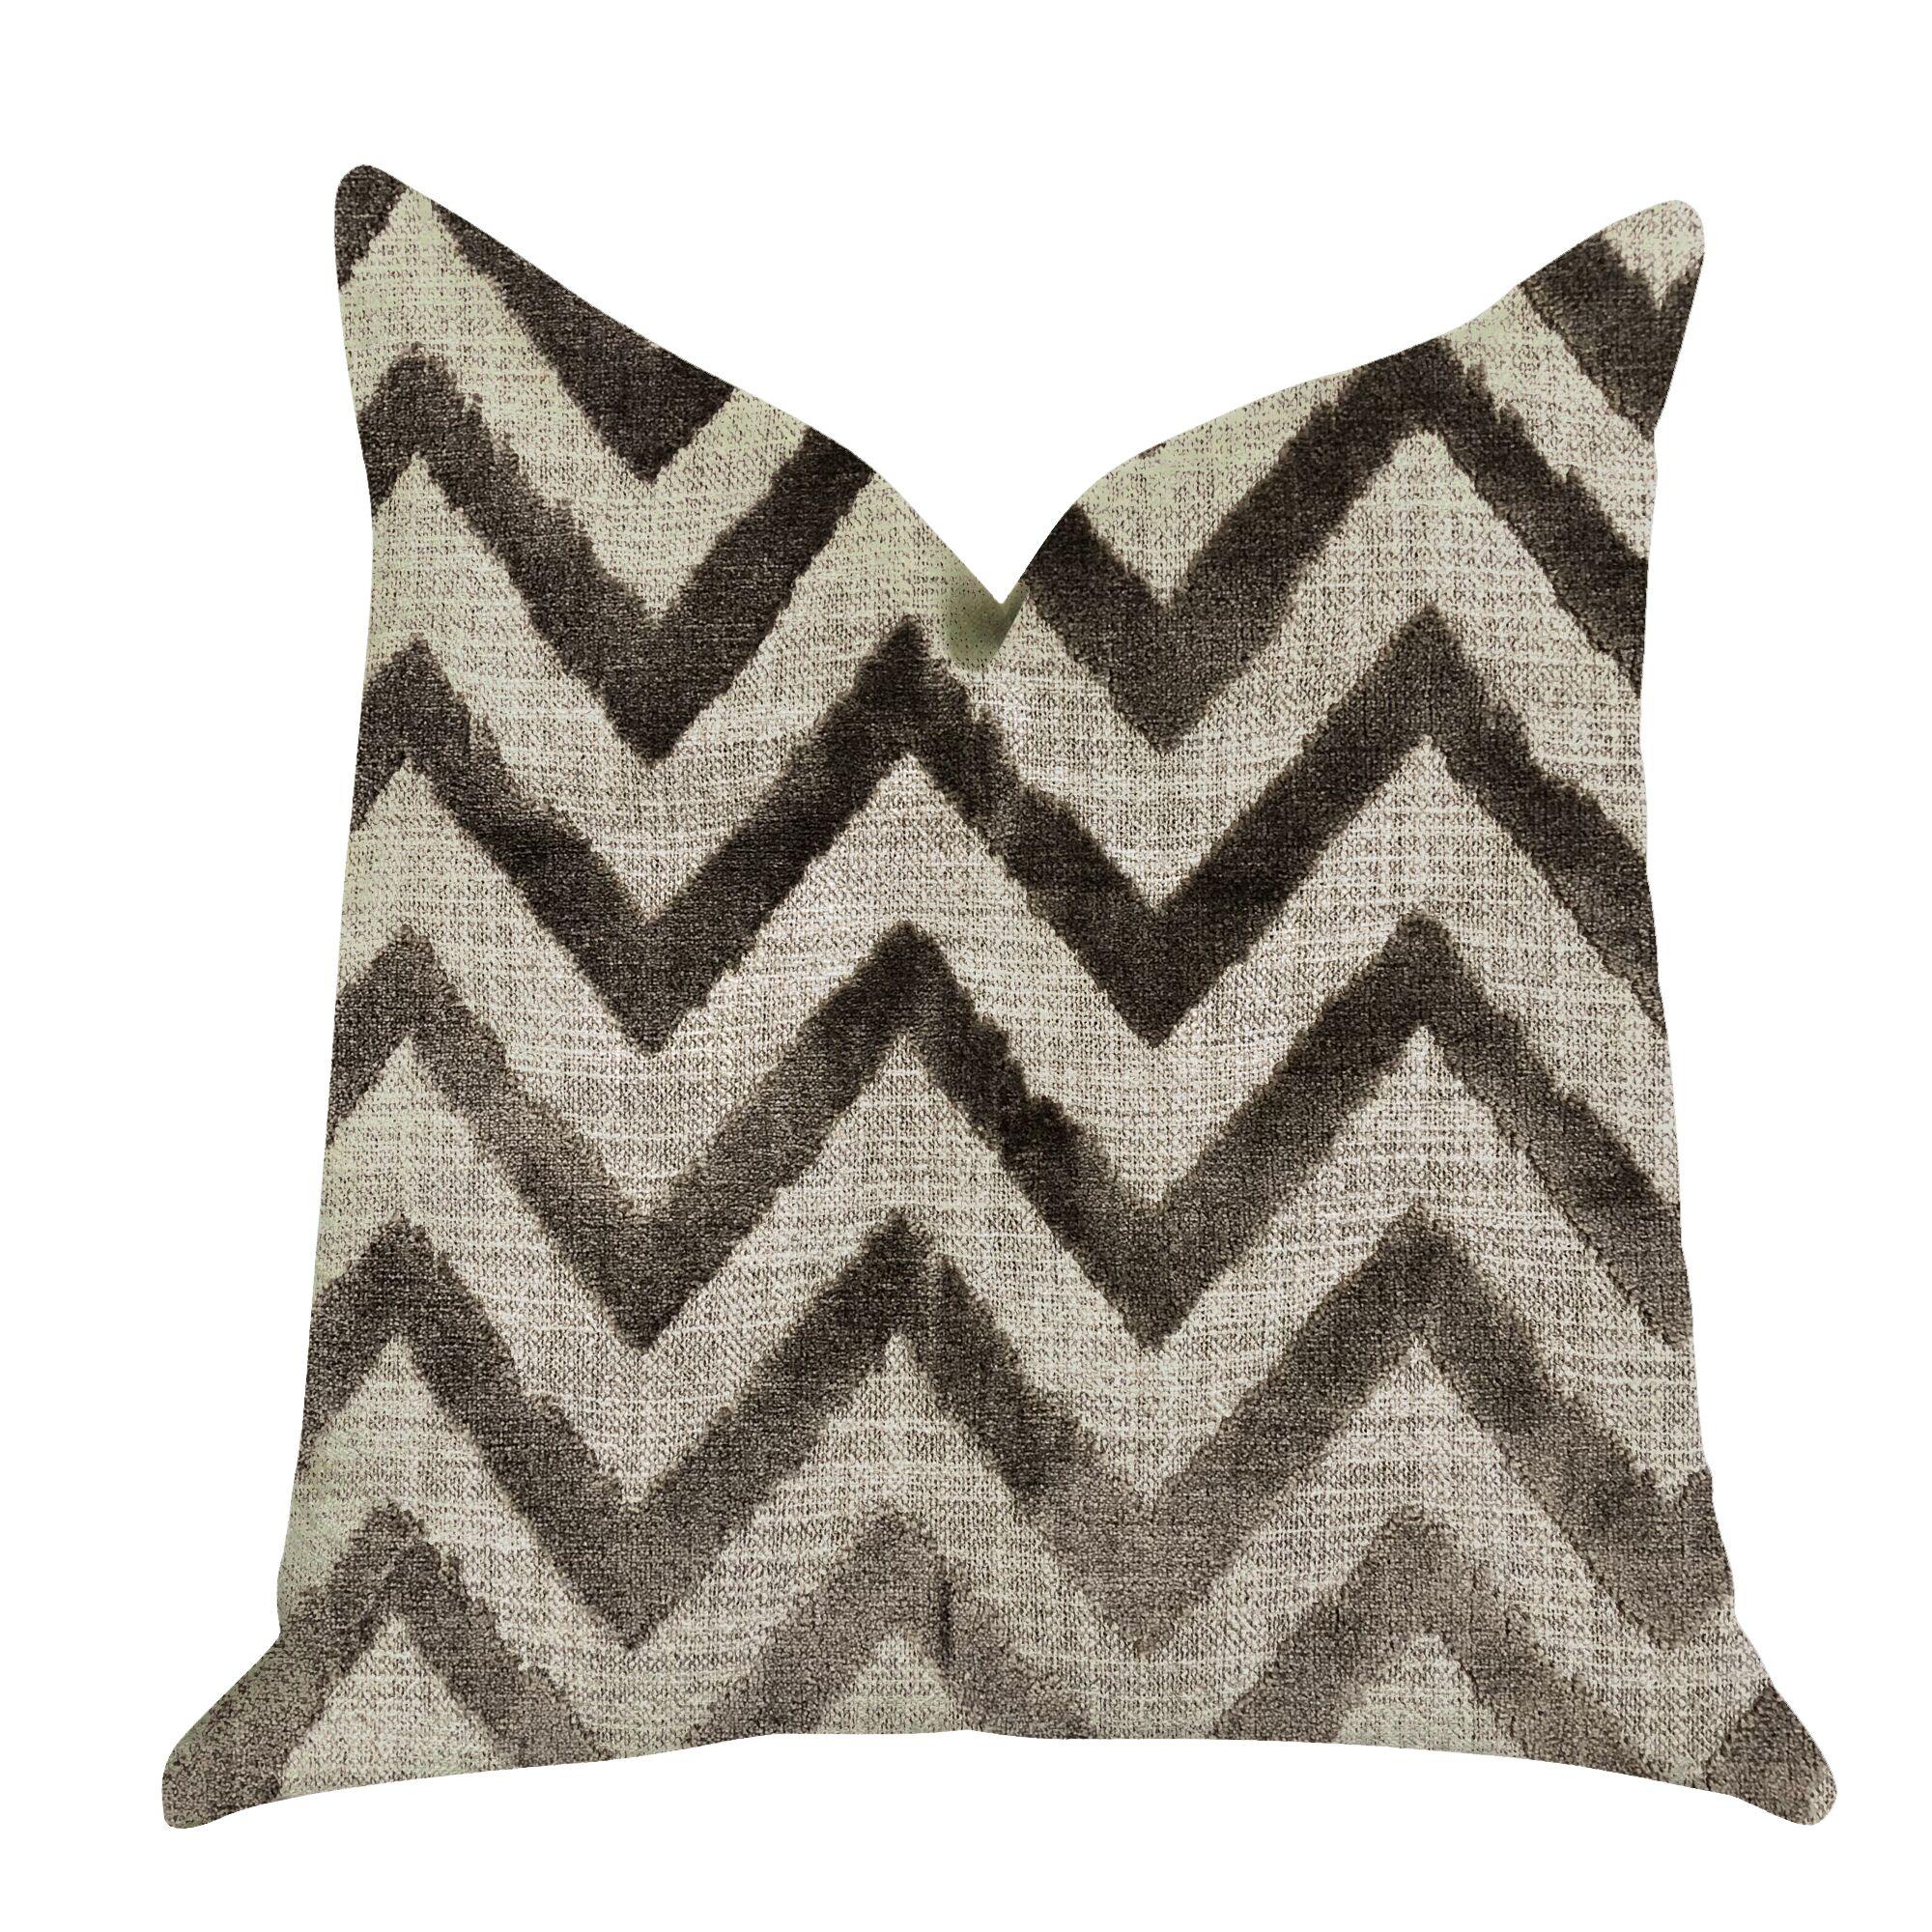 Demello Zigzag Luxury Pillow Size: 20